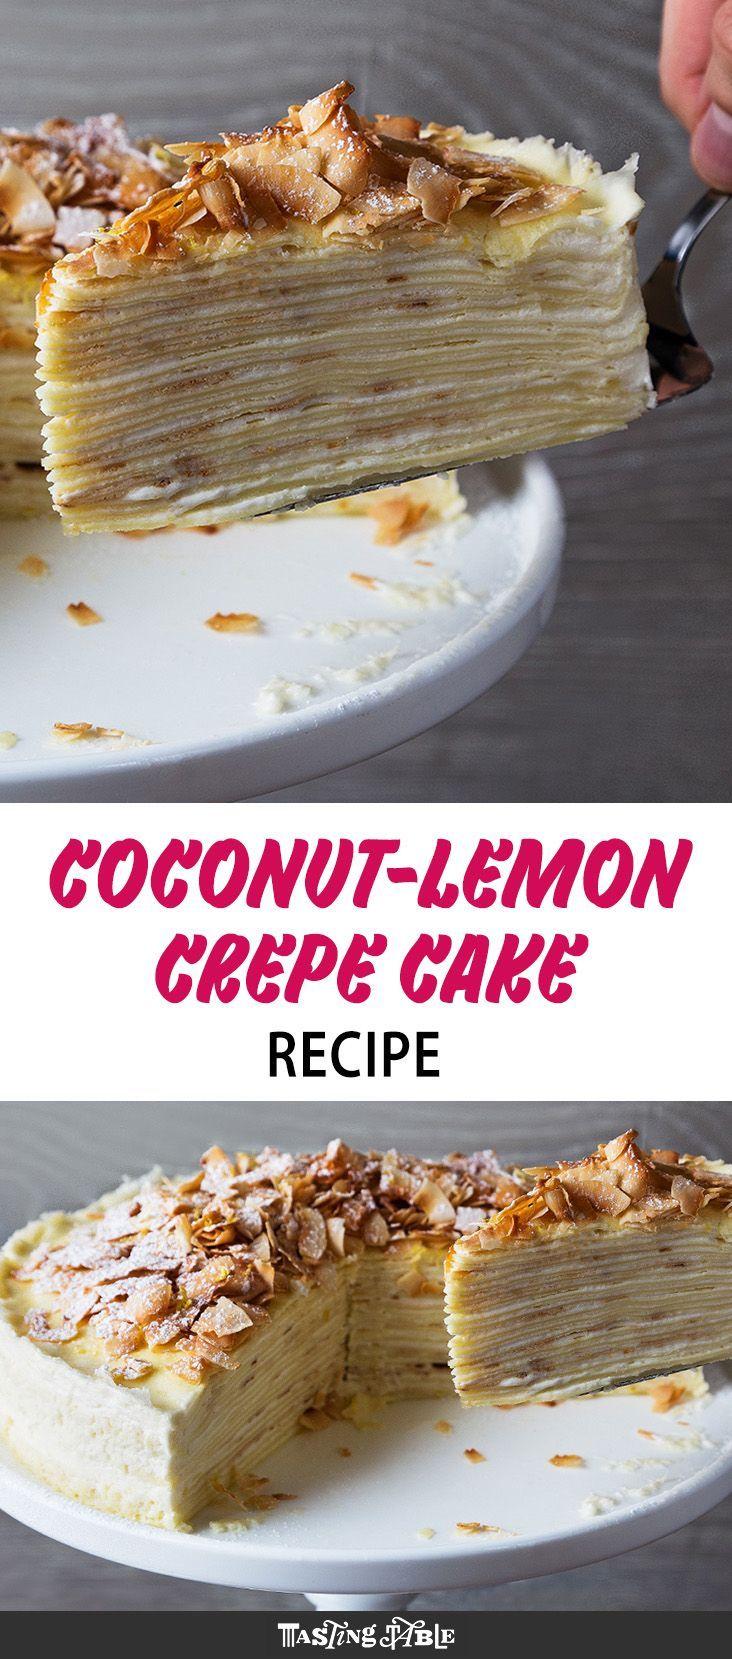 CoconutLemon Crepe Cake Recipe (With images) Lemon